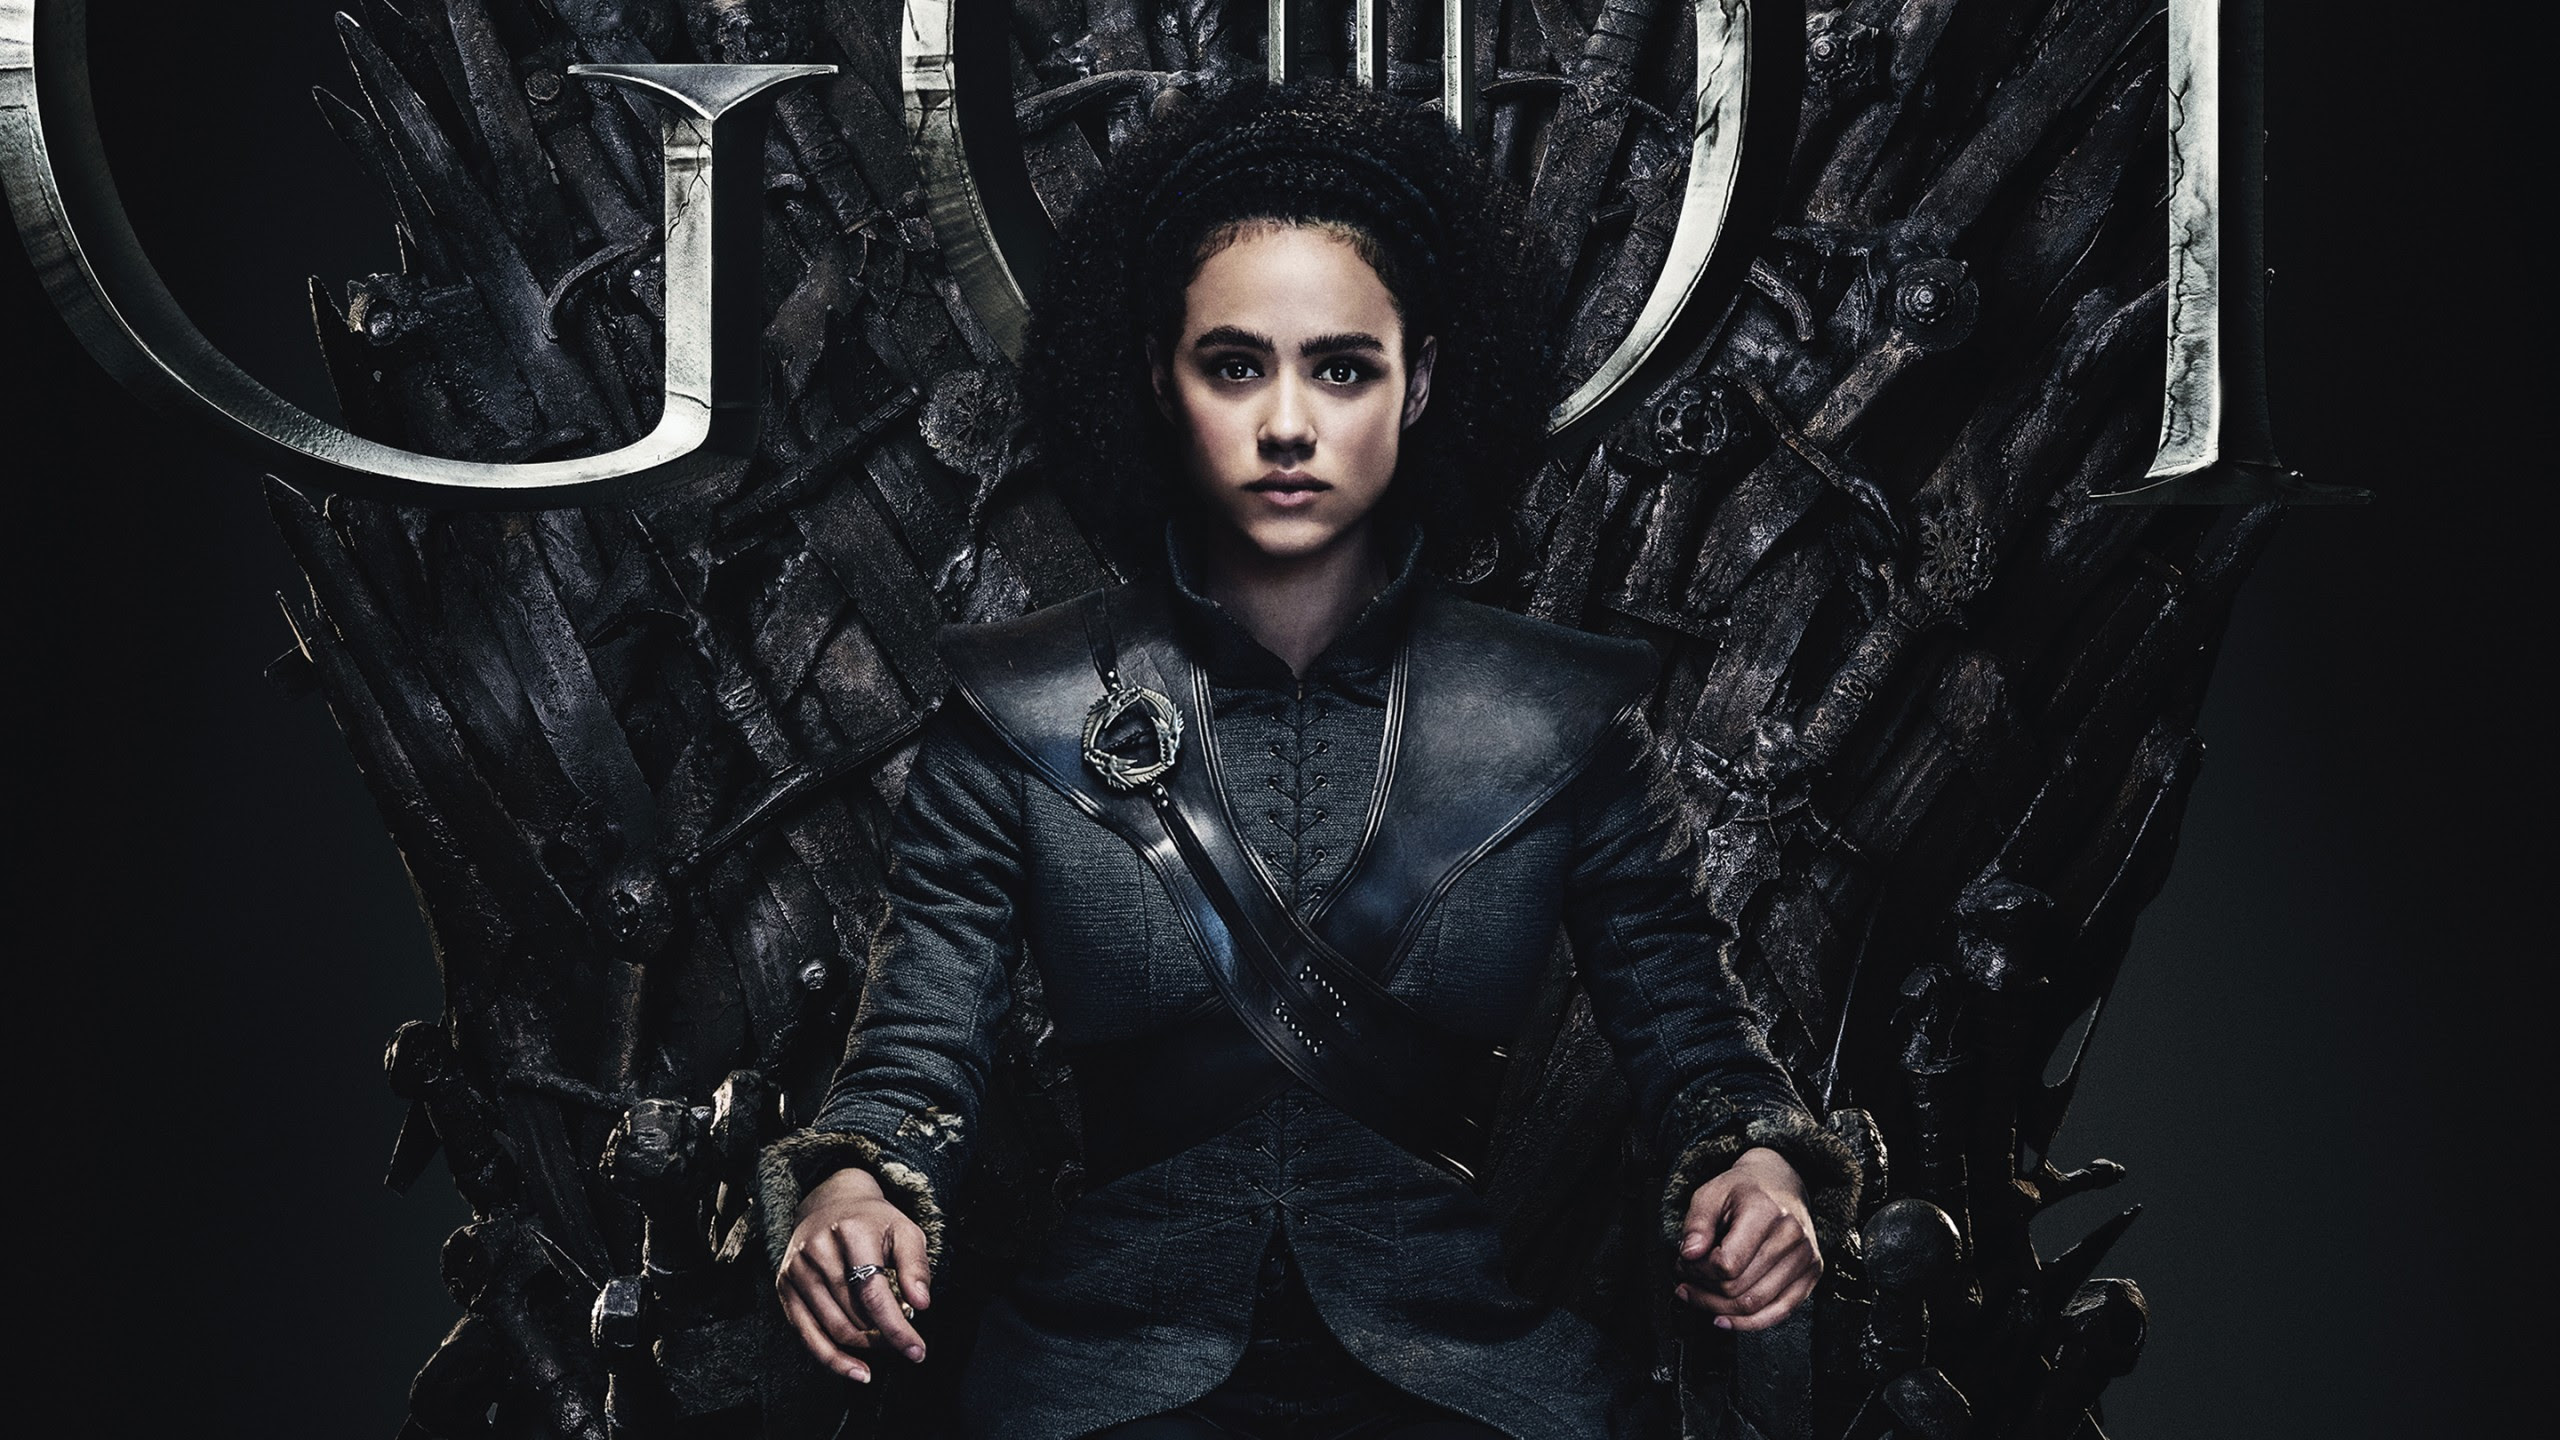 Missandei In Game Of Thrones Final Season 8 2019 Wallpapers Hd